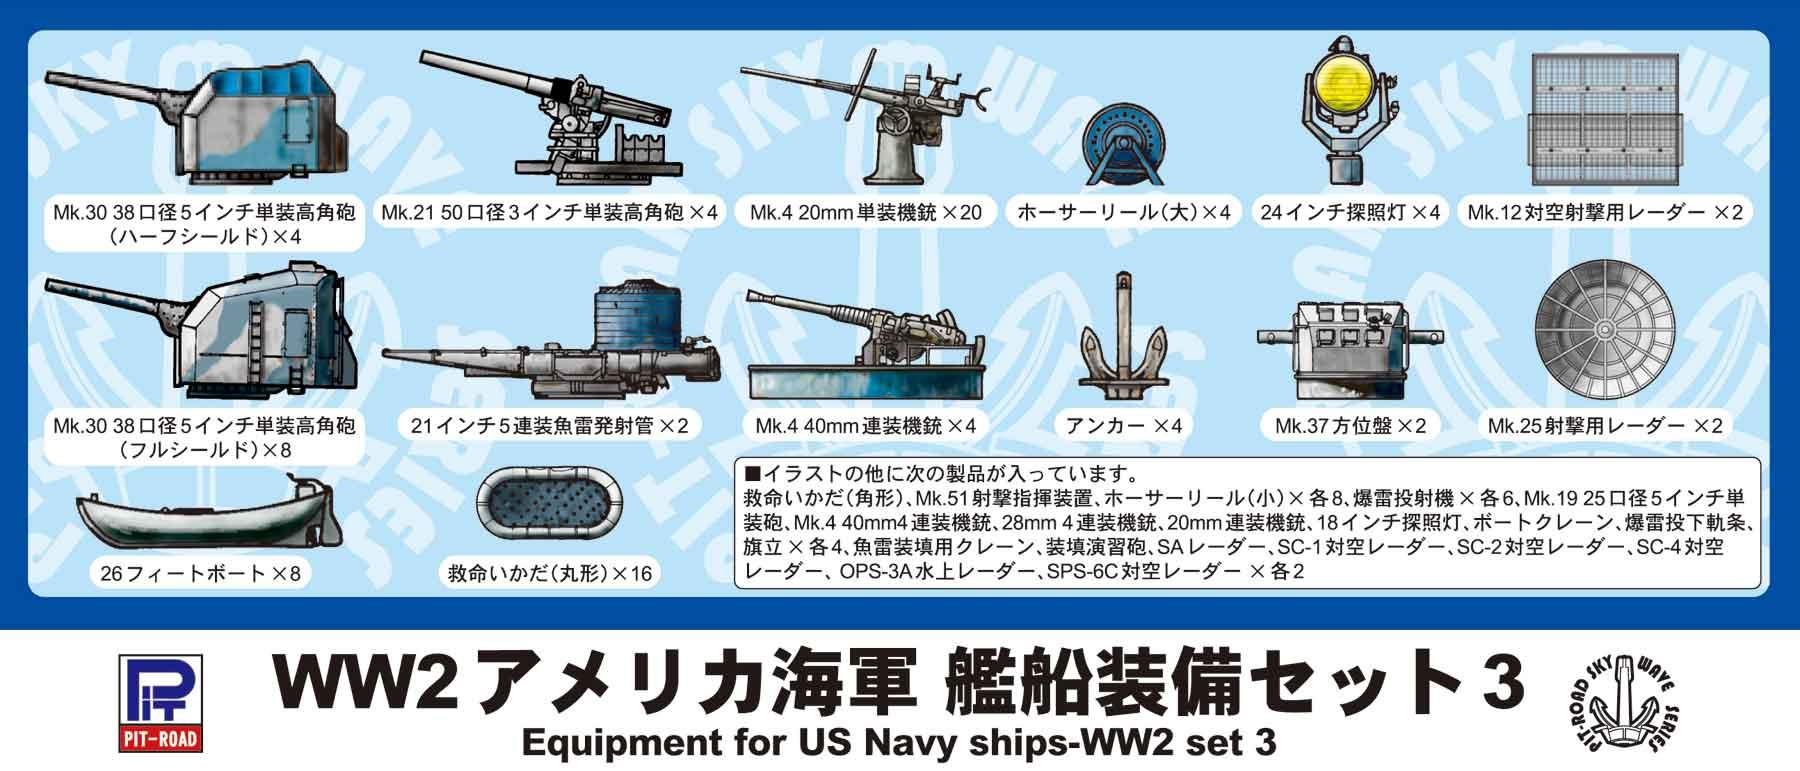 E06 1/700 WWII アメリカ海軍 艦船装備セット 3